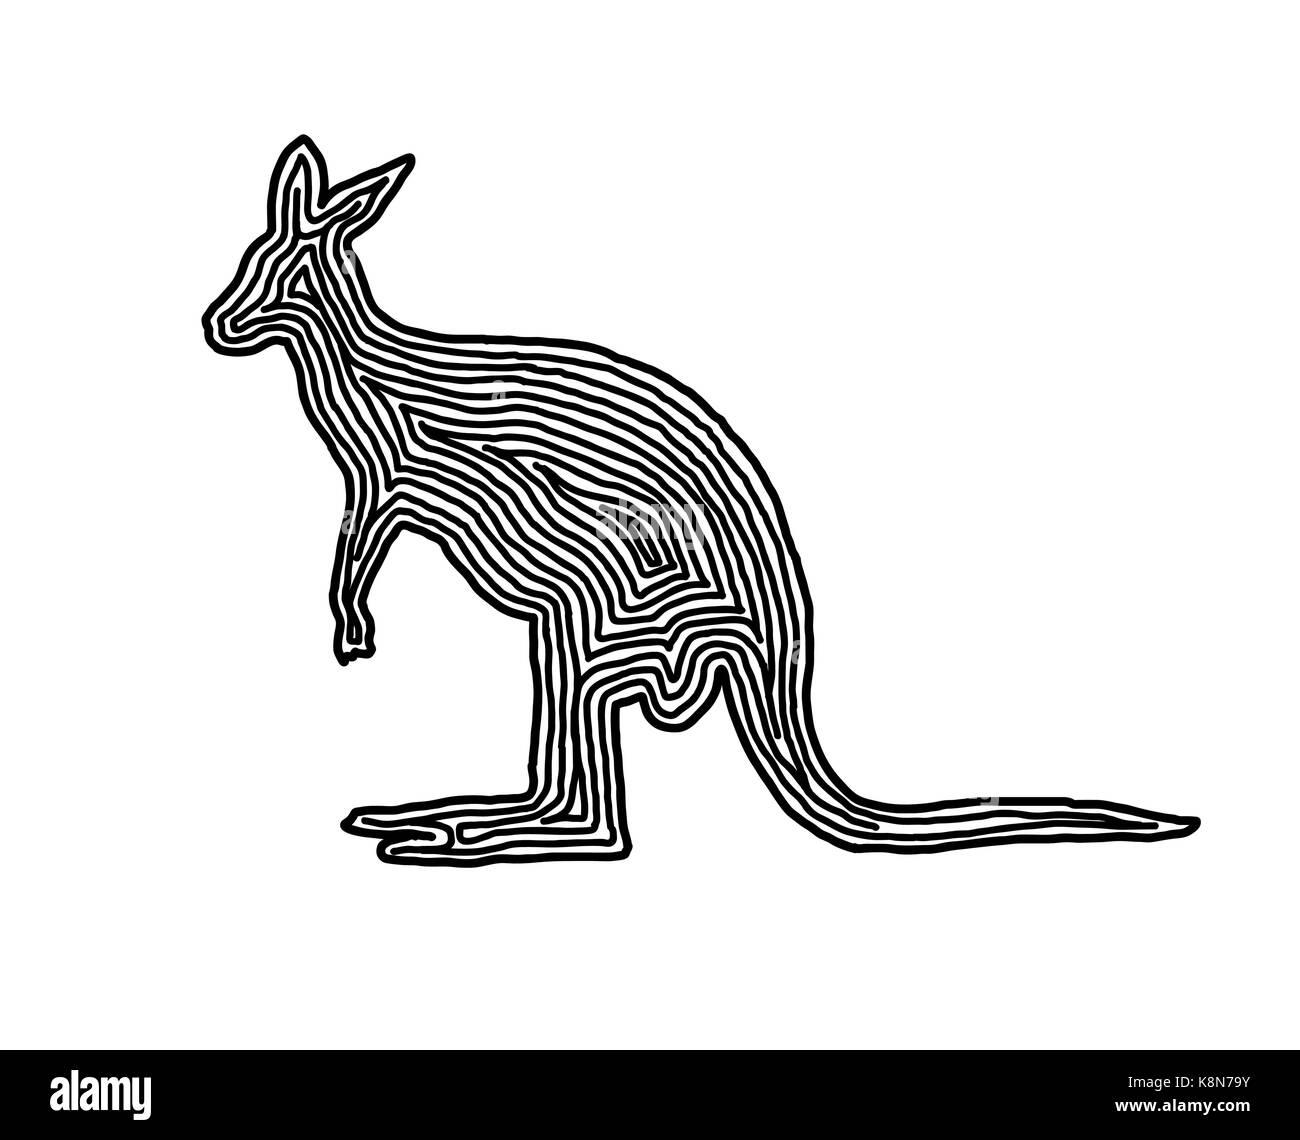 Kangaroo Vector Stockfotos & Kangaroo Vector Bilder - Alamy